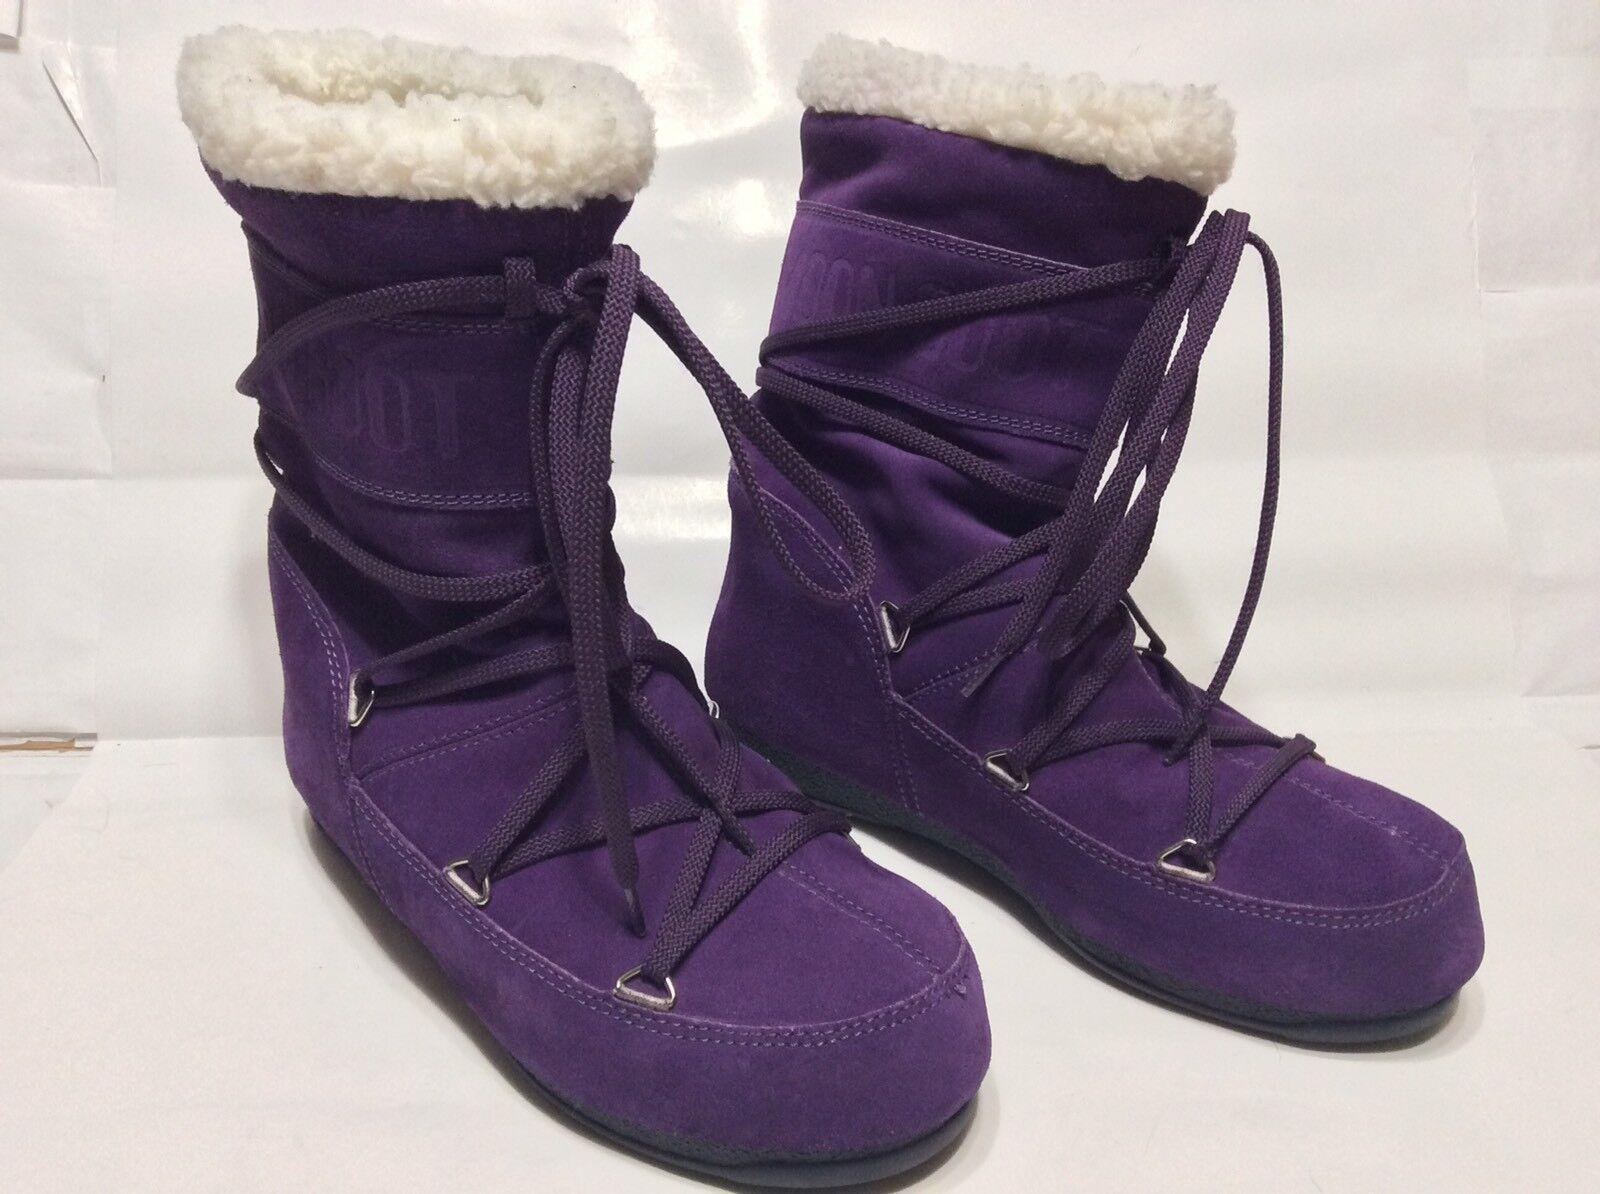 Tecnica Donna Butter Mid Moon Stivali Purple Tall Size 8.5 39 8.5 Size   JBY 24c71b